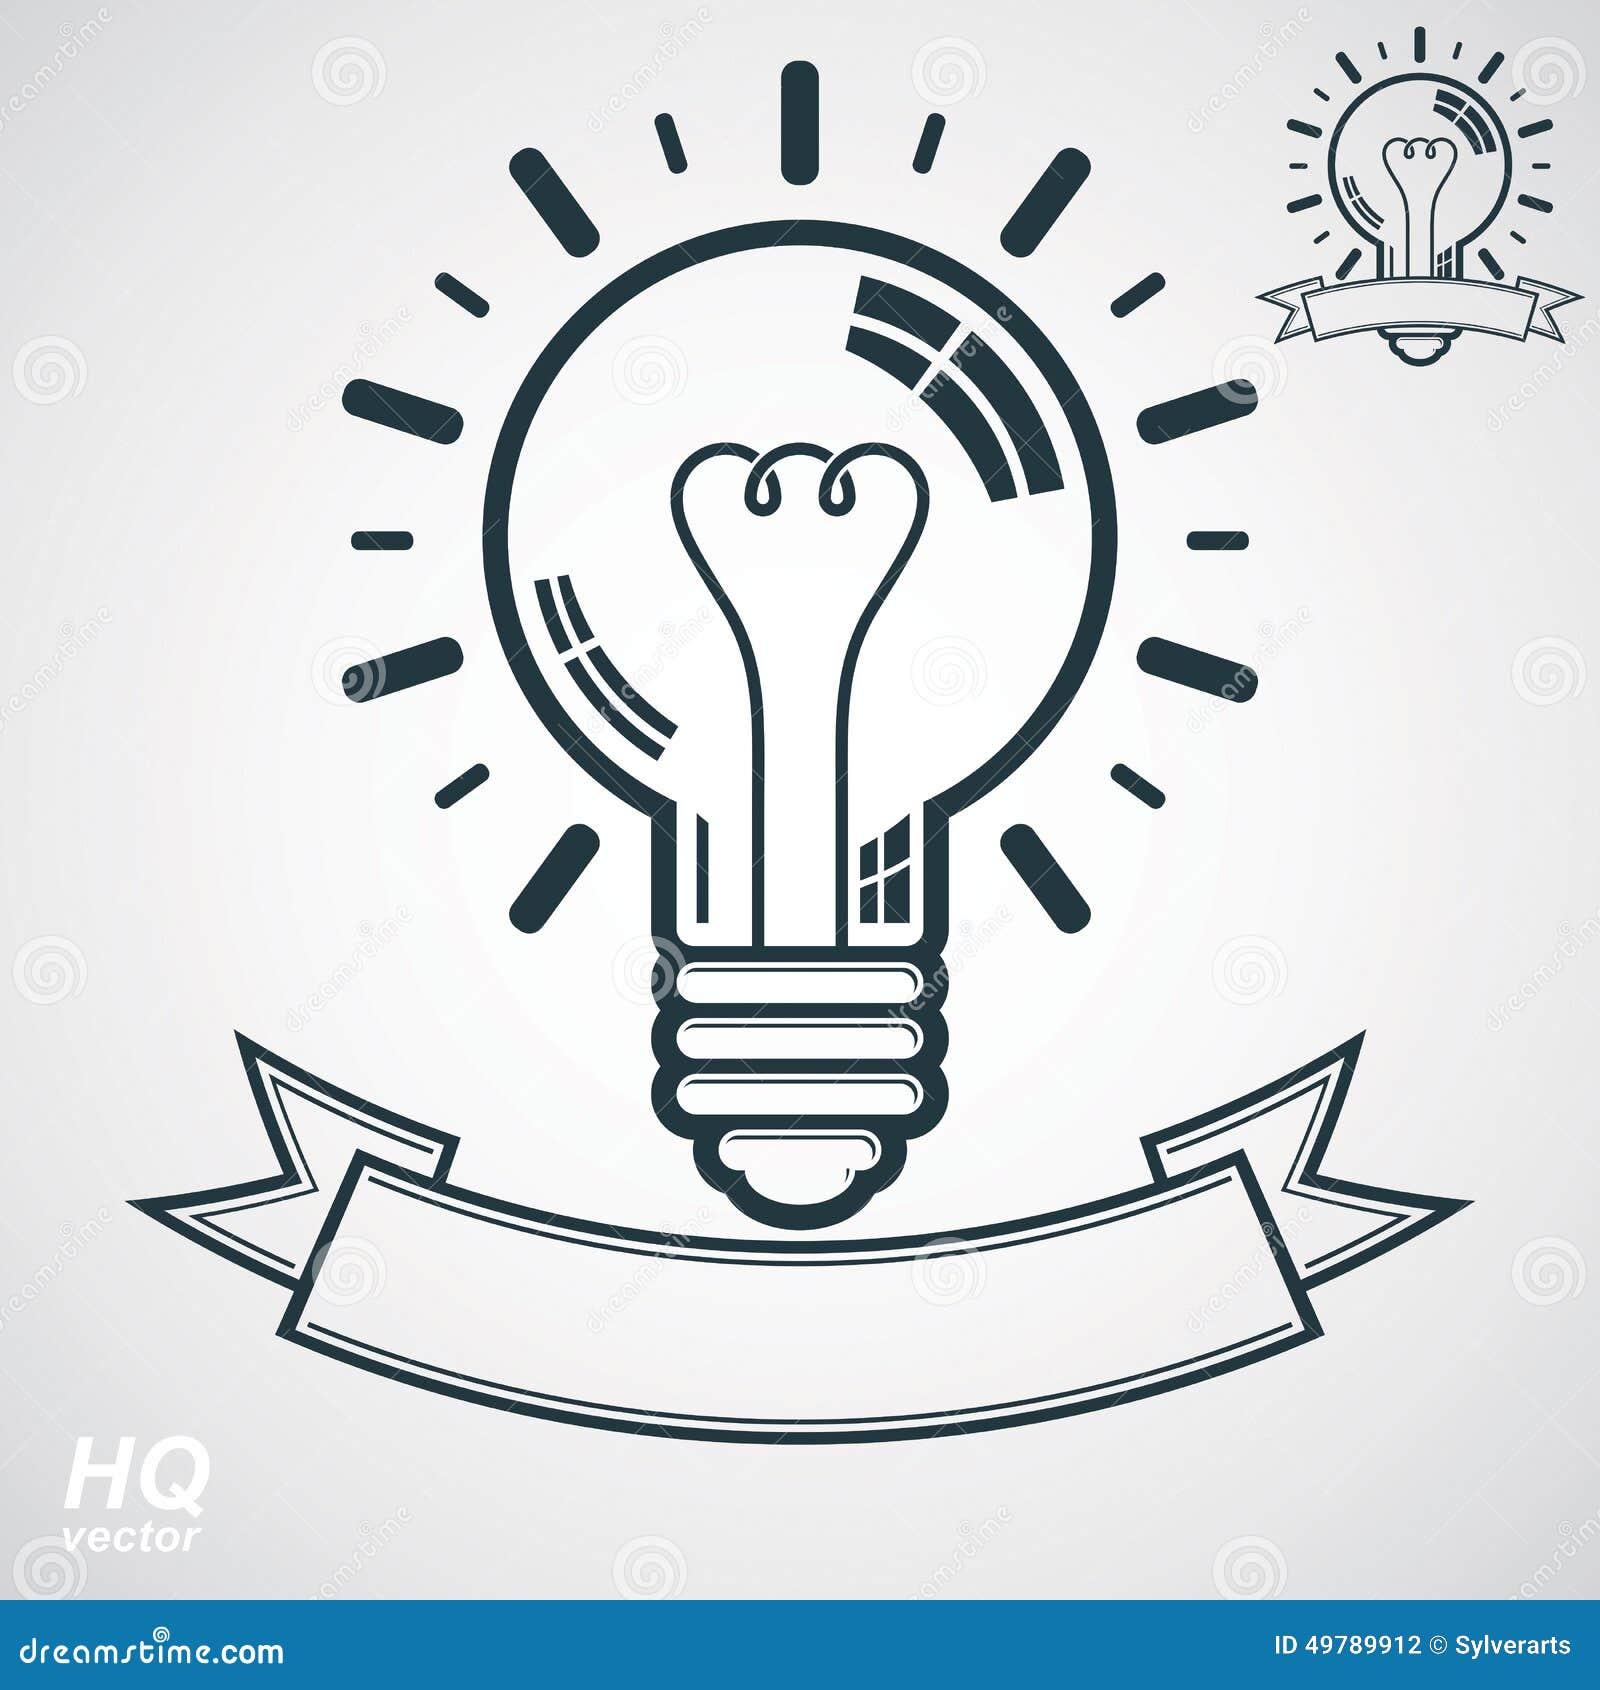 Electricity light bulb symbol insight emblem vector brain storm electricity light bulb symbol insight emblem vector brain storm conceptual icon corporate problem solution theme buycottarizona